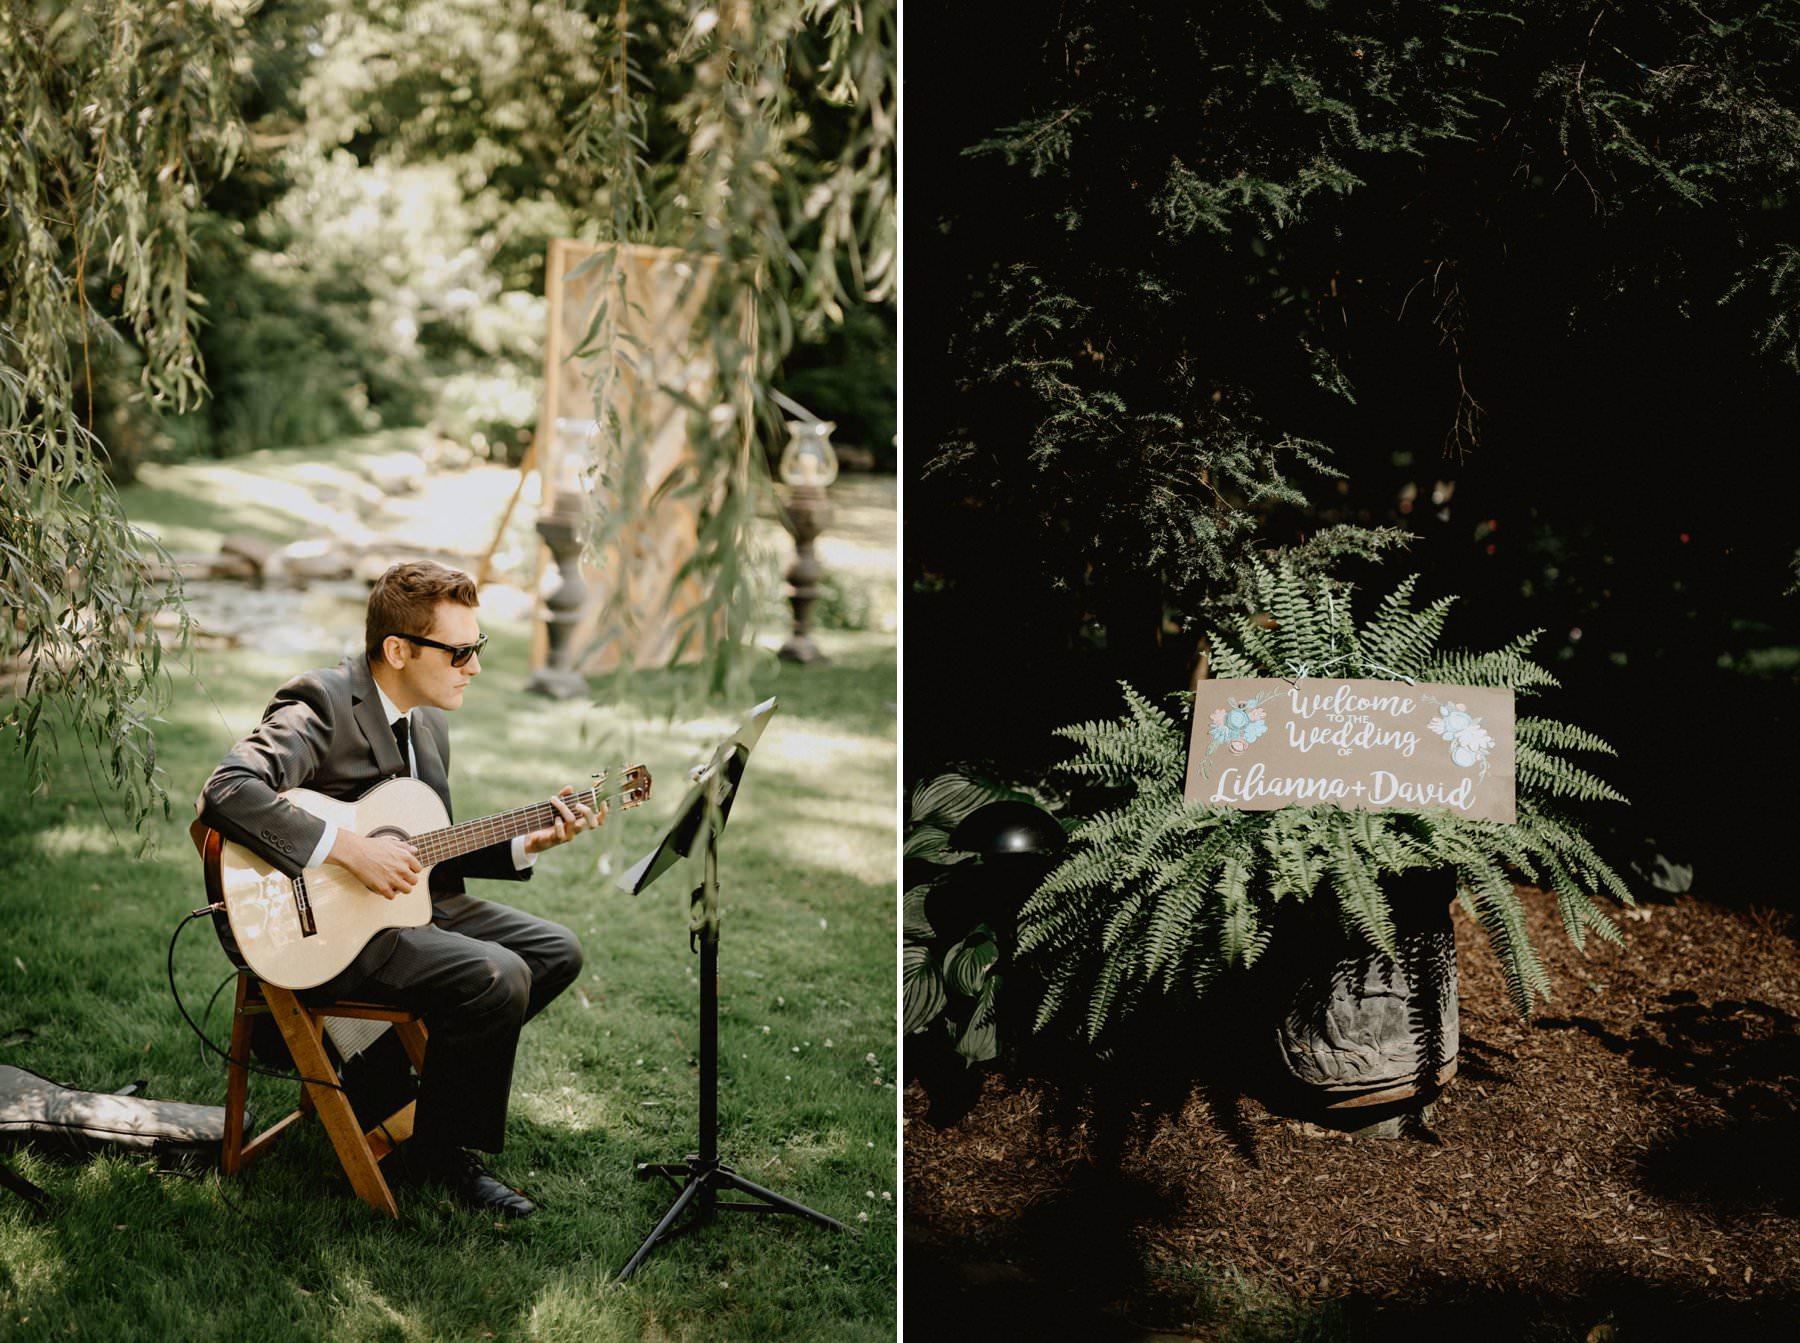 Appleford-estate-wedding-79.jpg